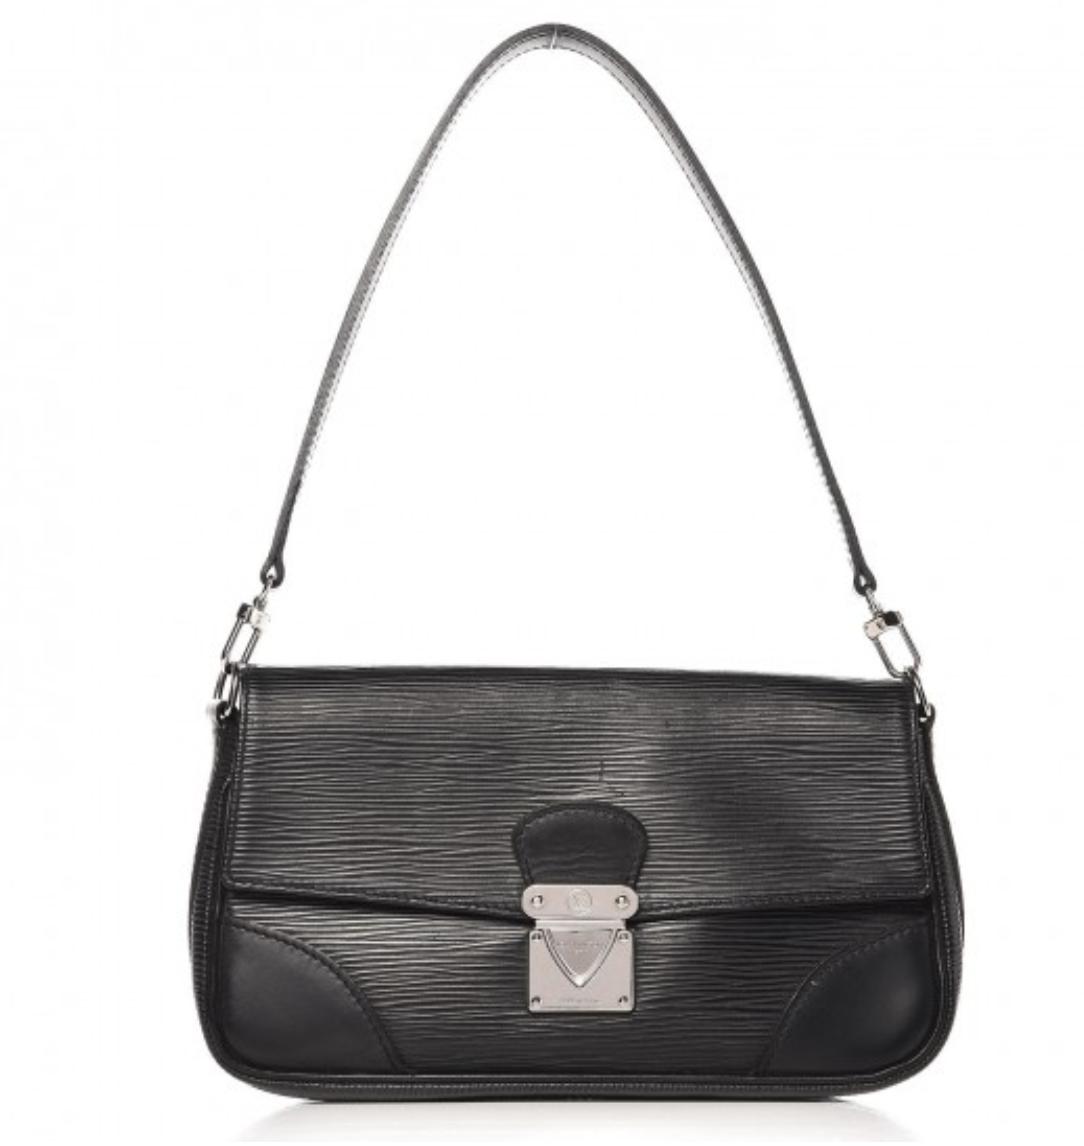 Louis Vuitton Epi Segur Pochette ($450)